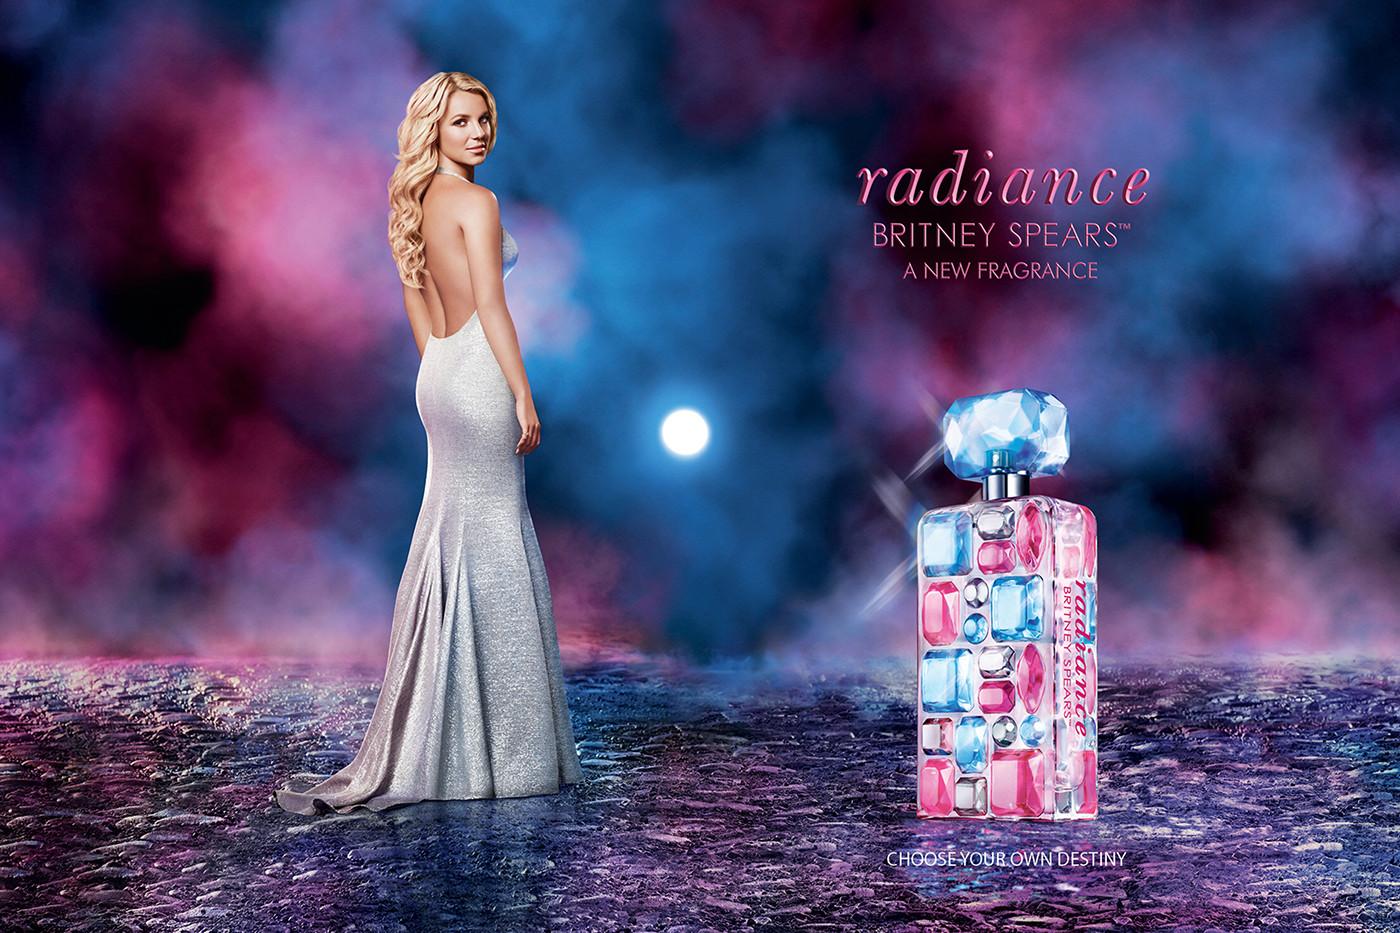 Britney-Spears-Radiance-Print-3000x2000.jpg